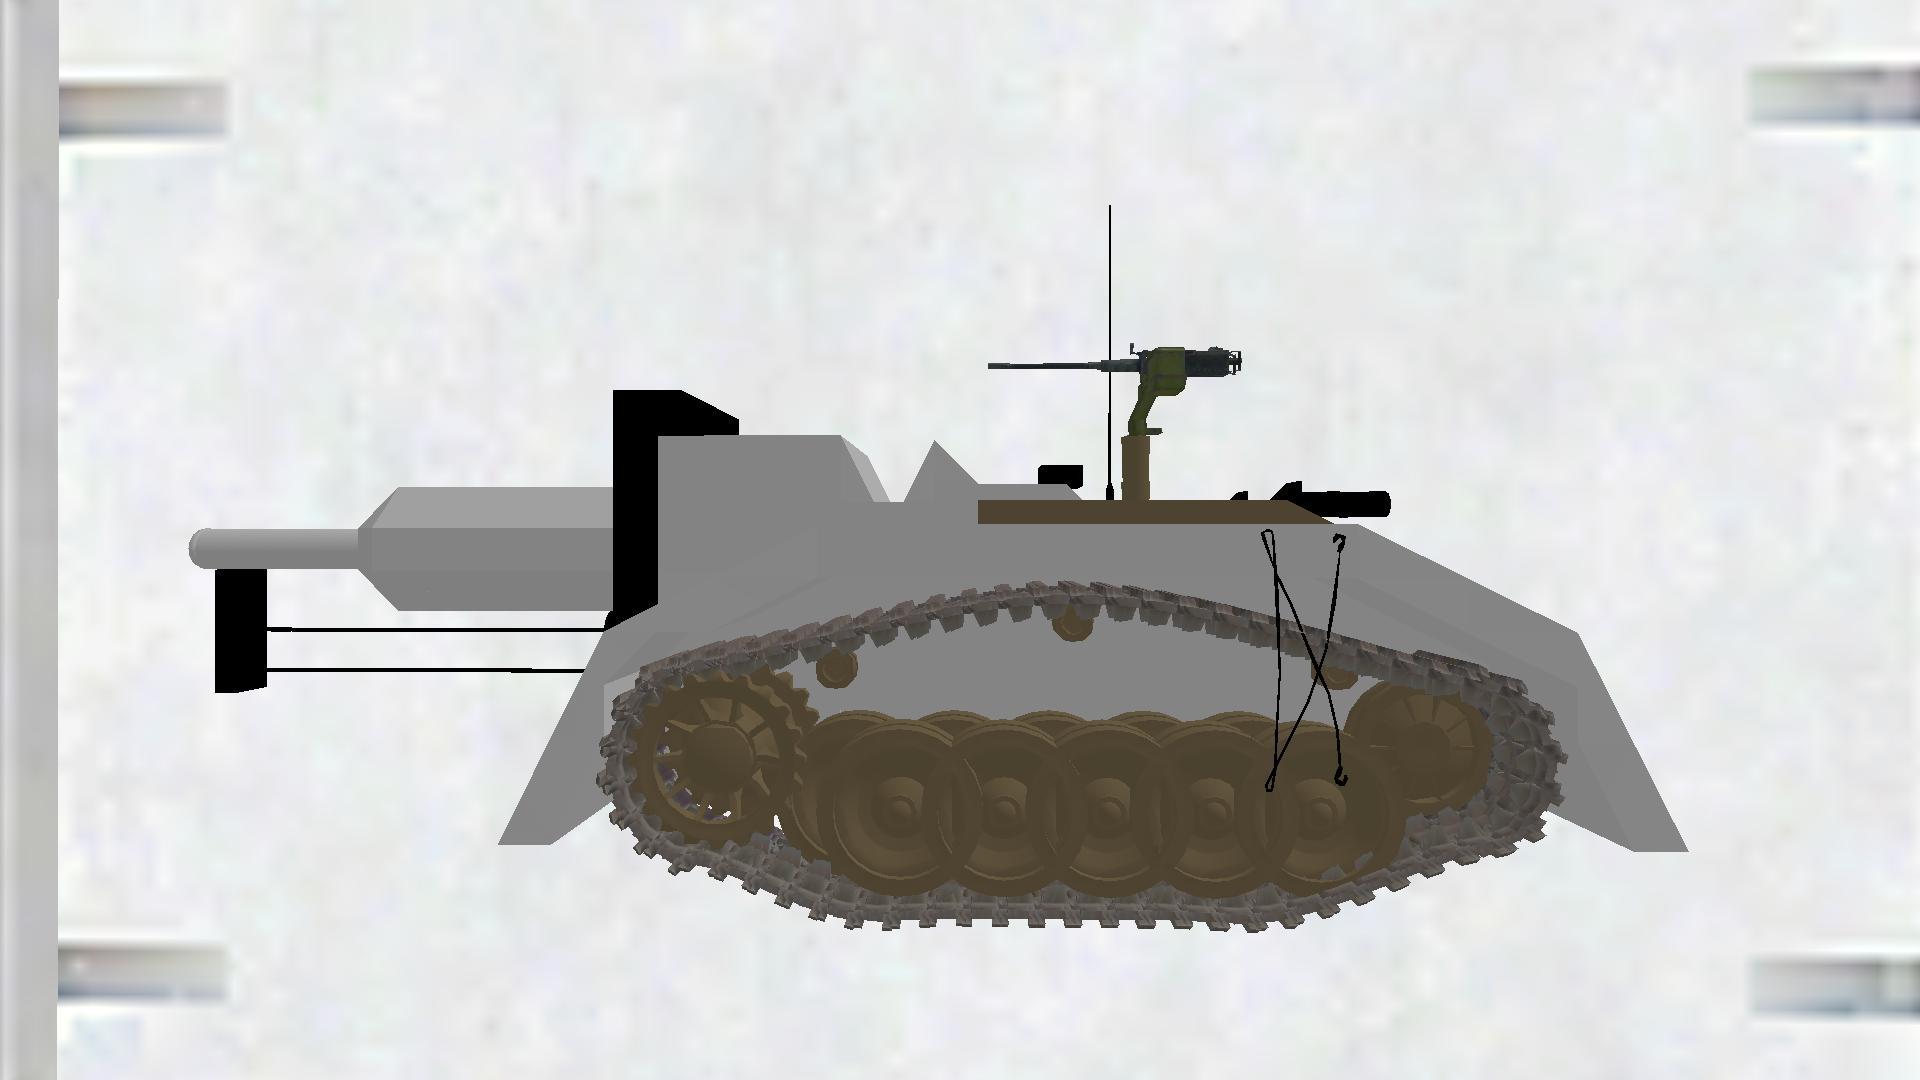 DT5679 superlauncherkillertank